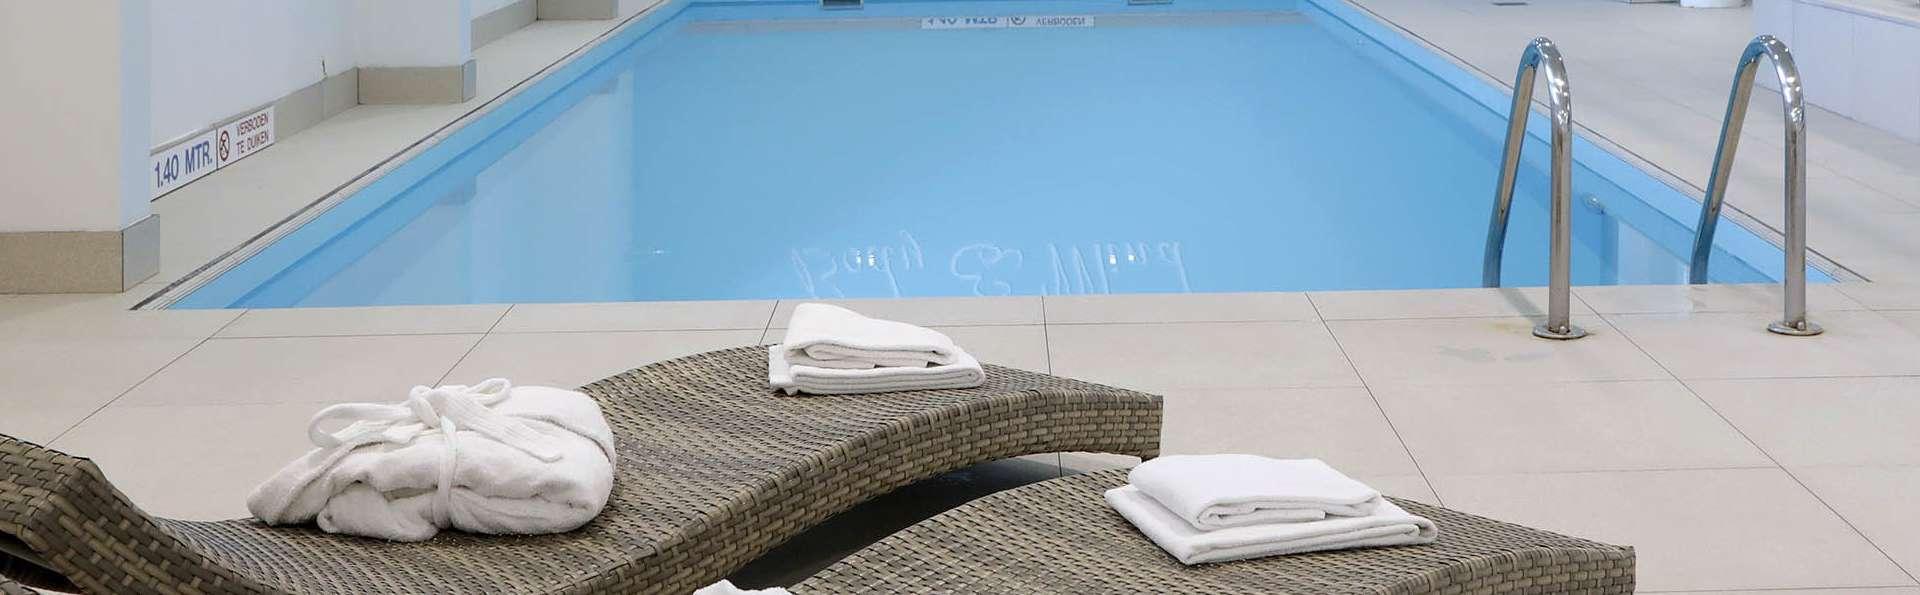 Churchill hotel Terneuzen - Churchillhotel_Terneuzen_4687_new.jpg